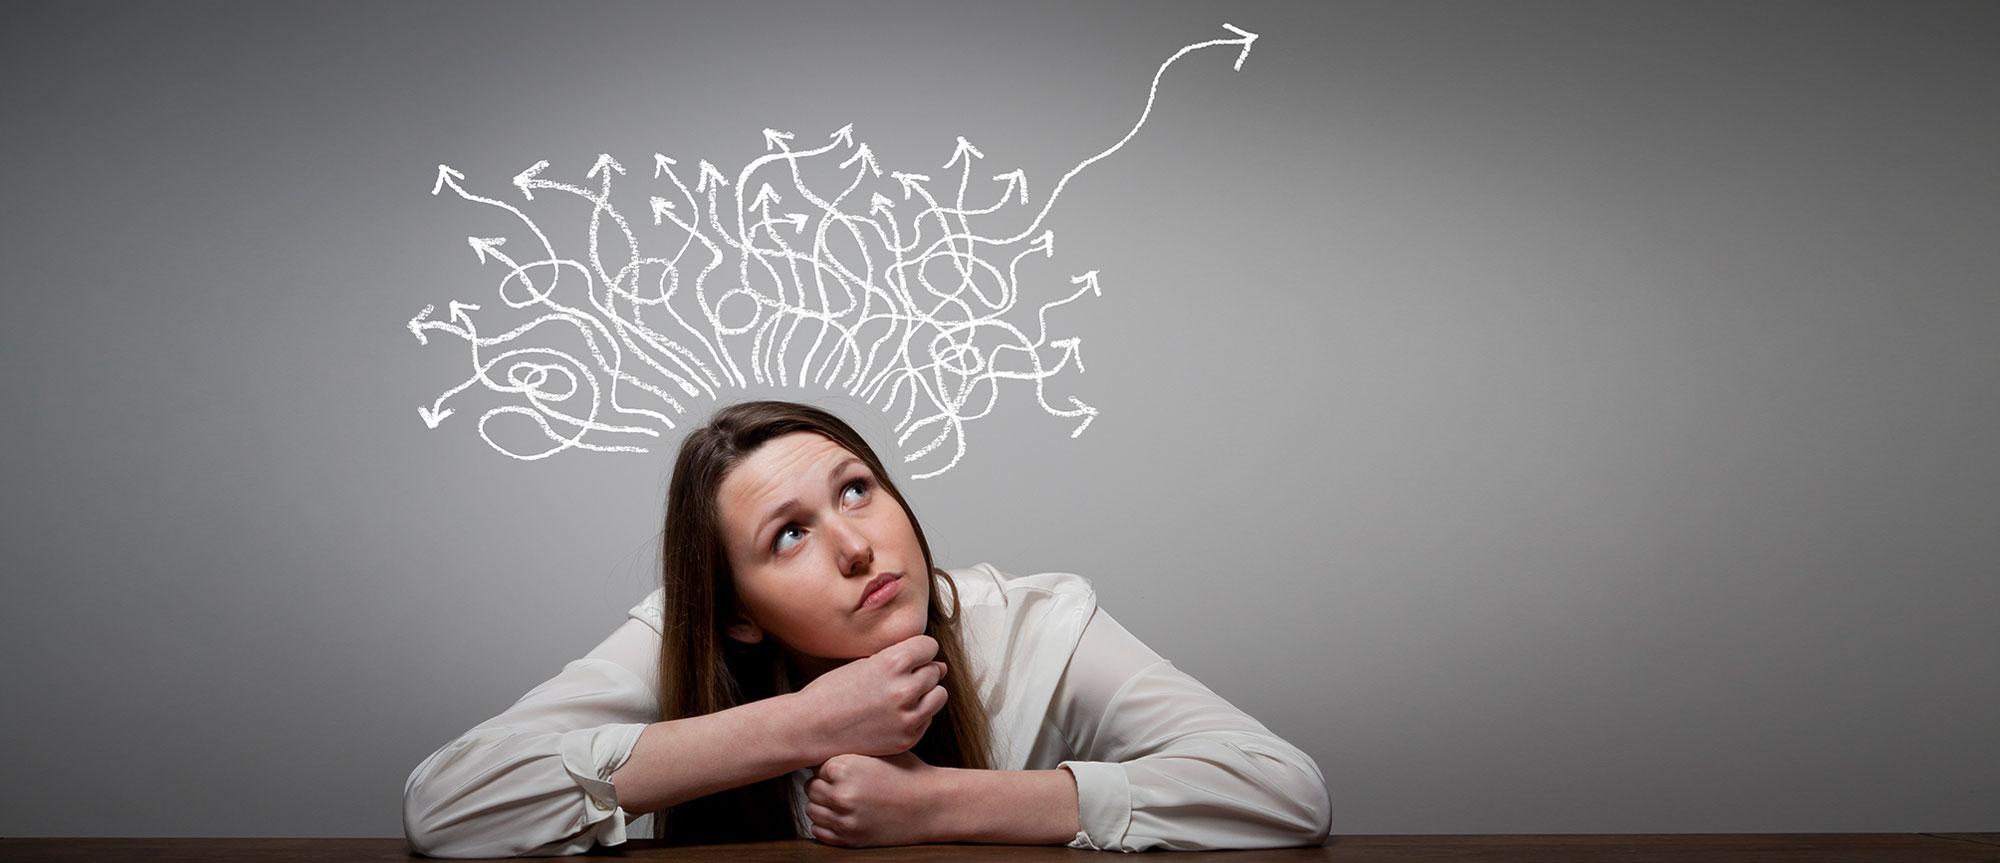 Desenvolver inteligência emocional